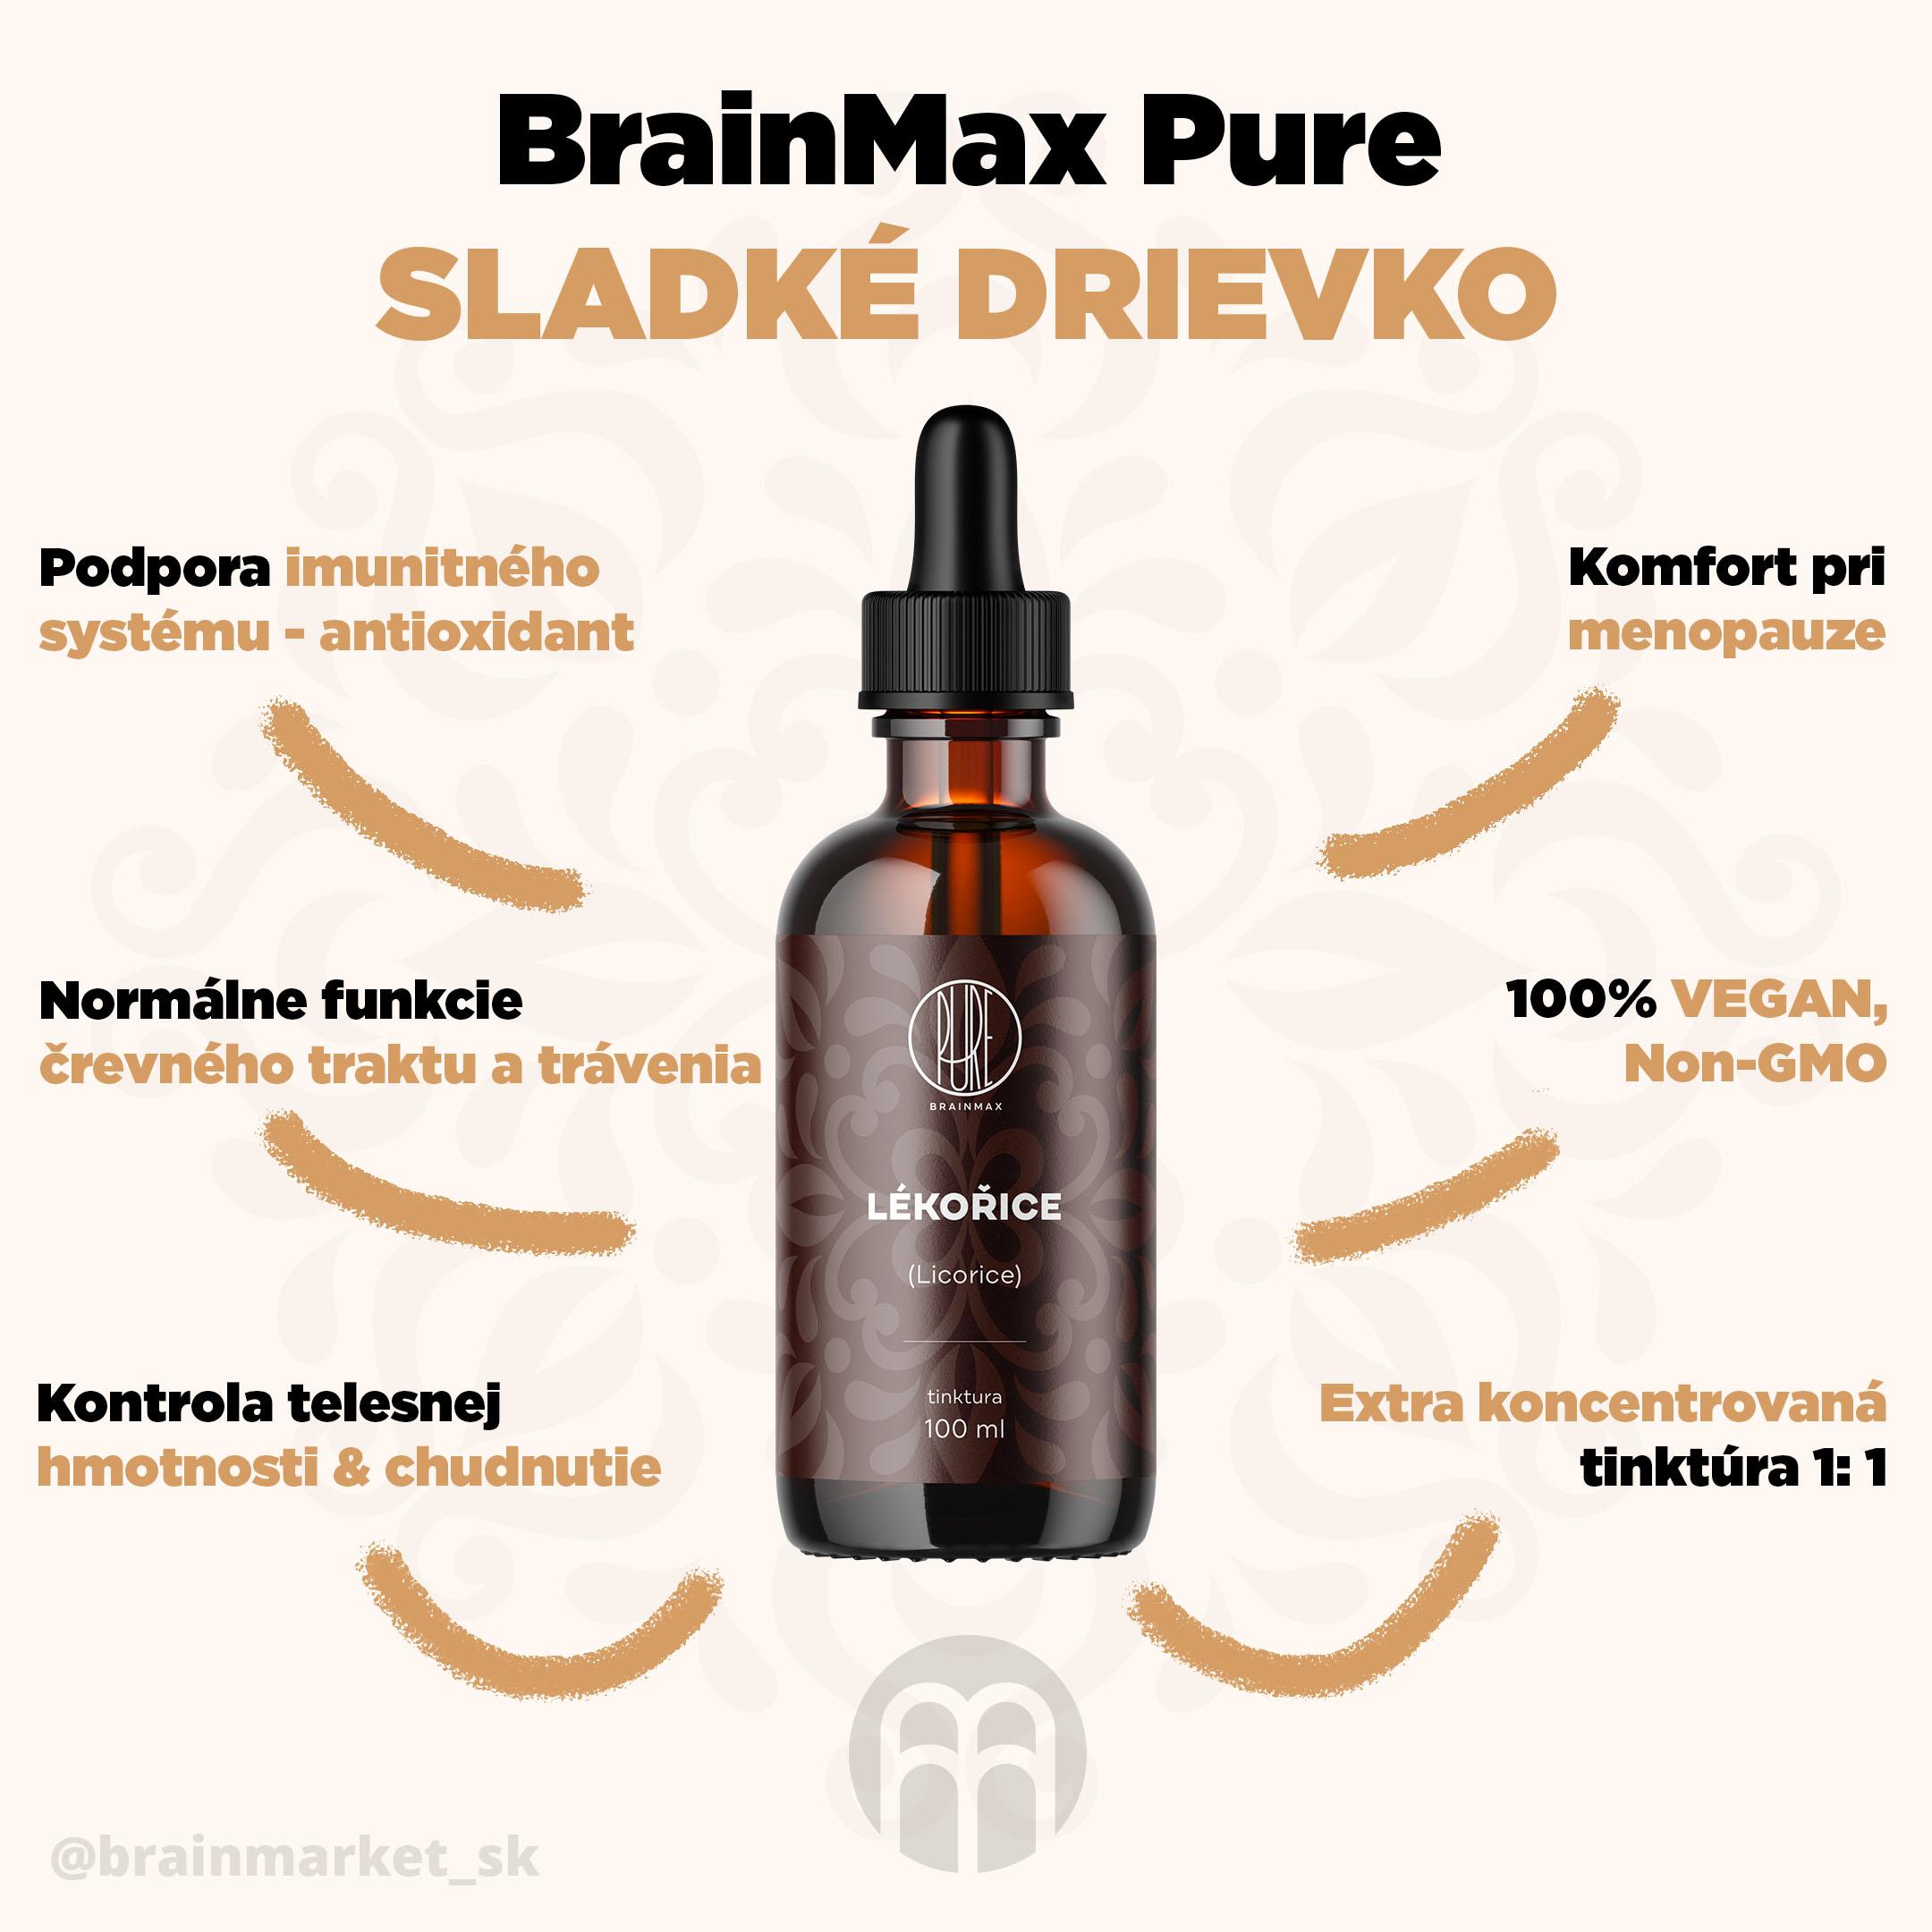 lekorice_infografika_brainmarket_sk